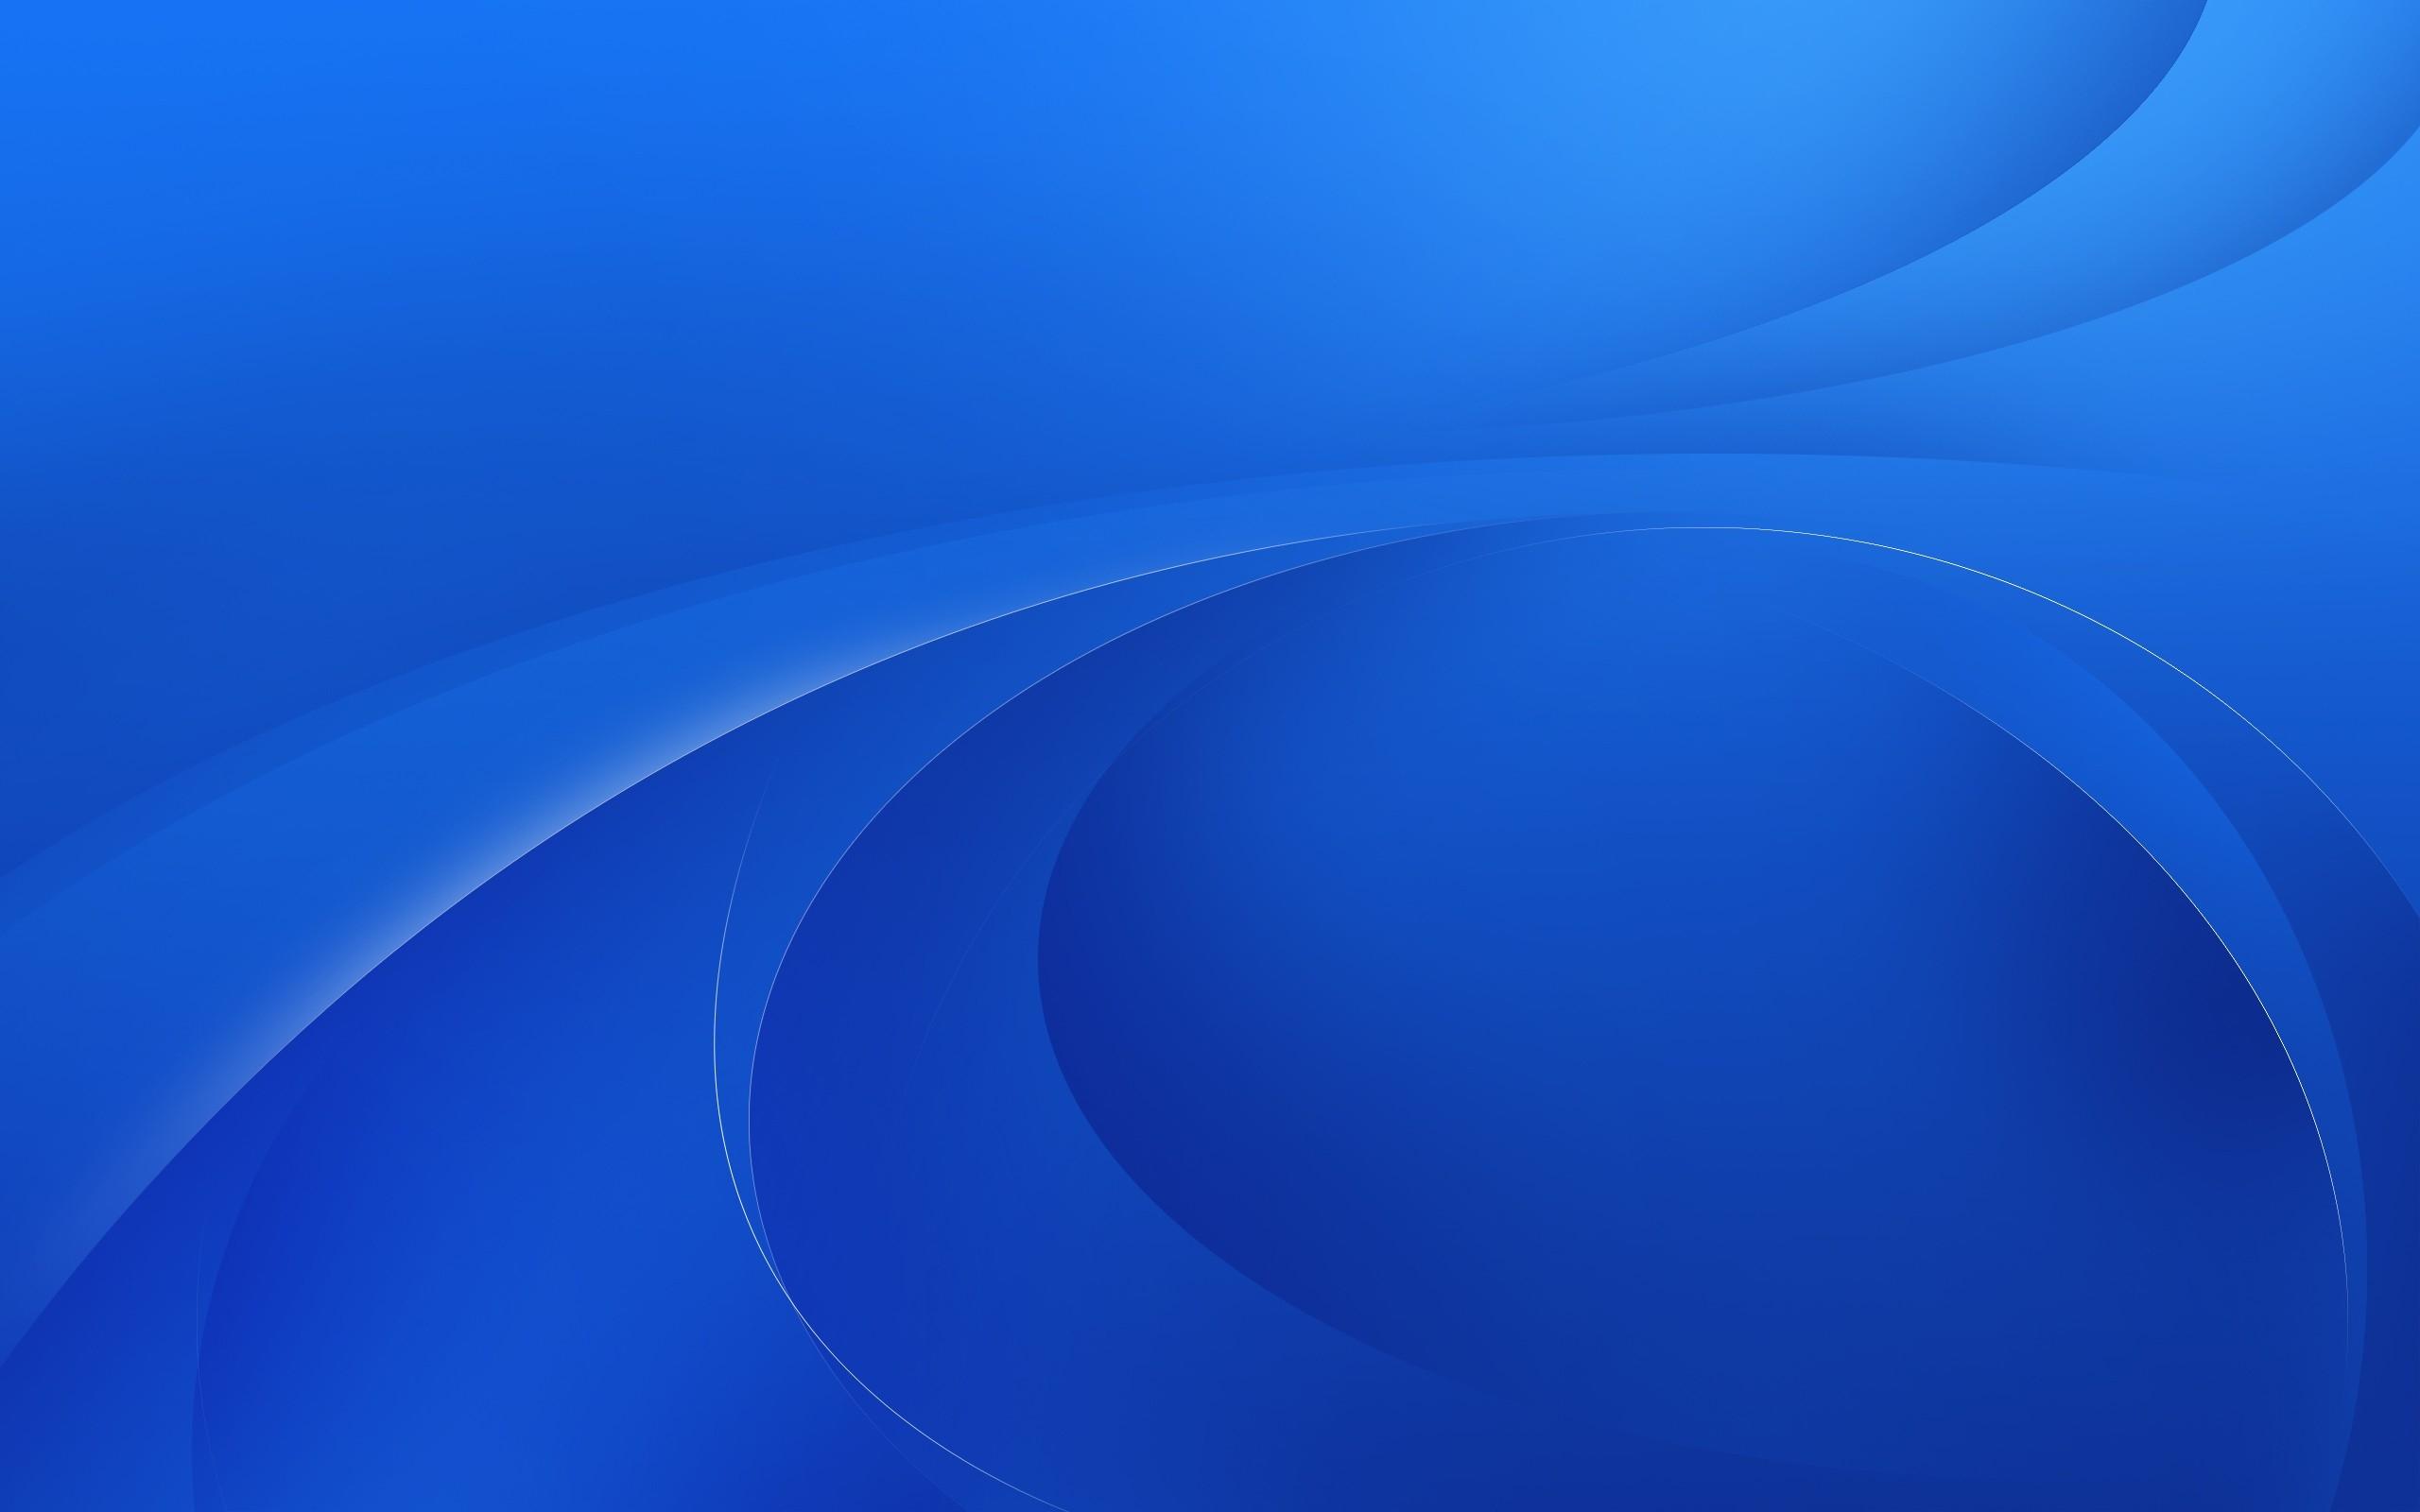 Fondos de pantalla azul l nea oval fondo 2560x1600 for Sfondi blu hd